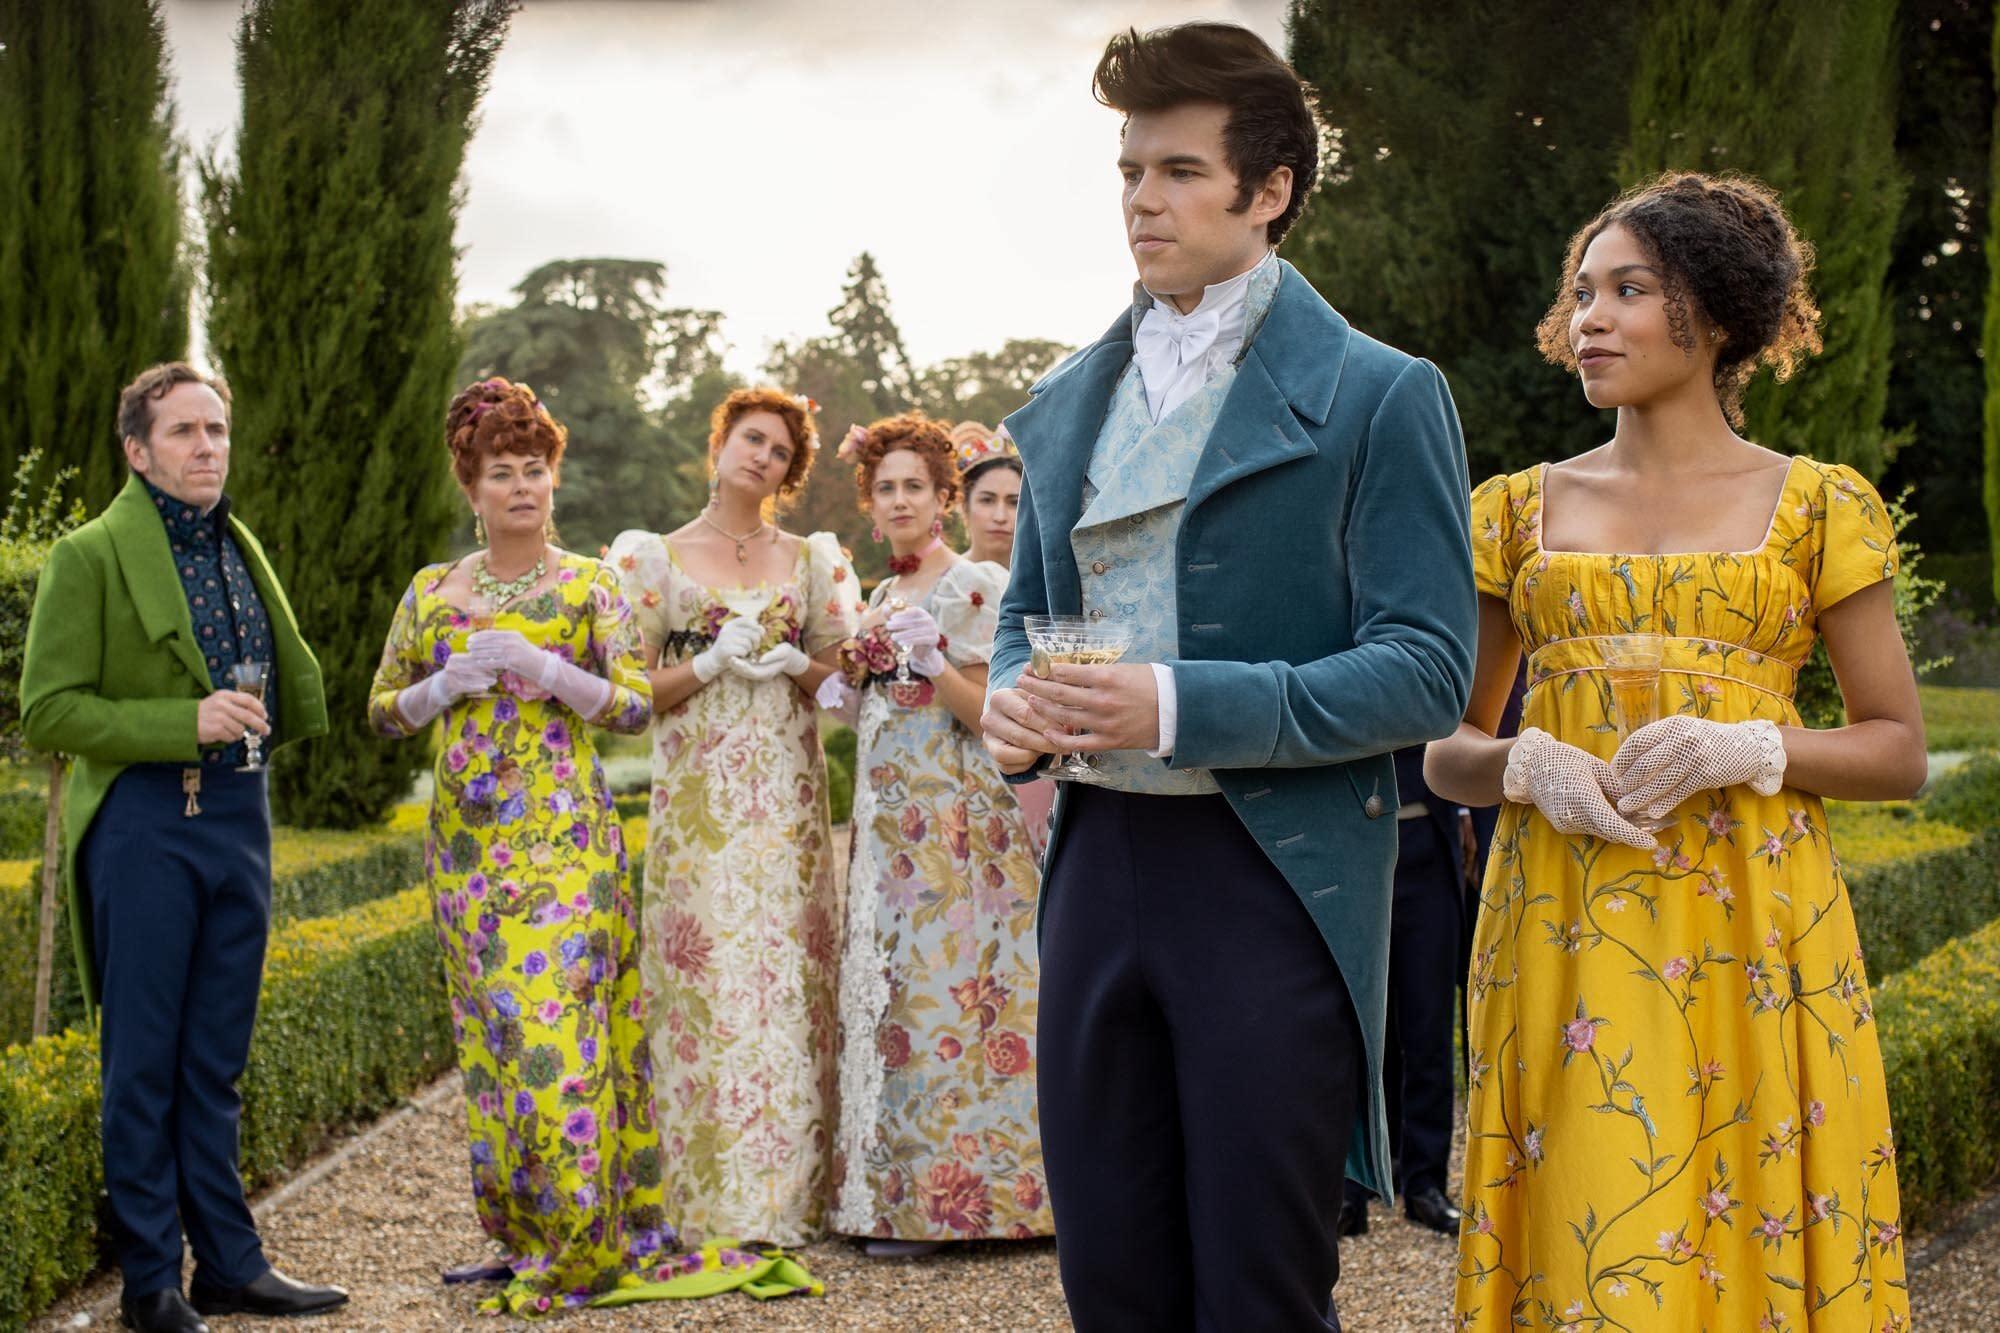 Bridgerton on Netflix: Everything We Know About Shondalands Downton Abbey-Gossip Girl